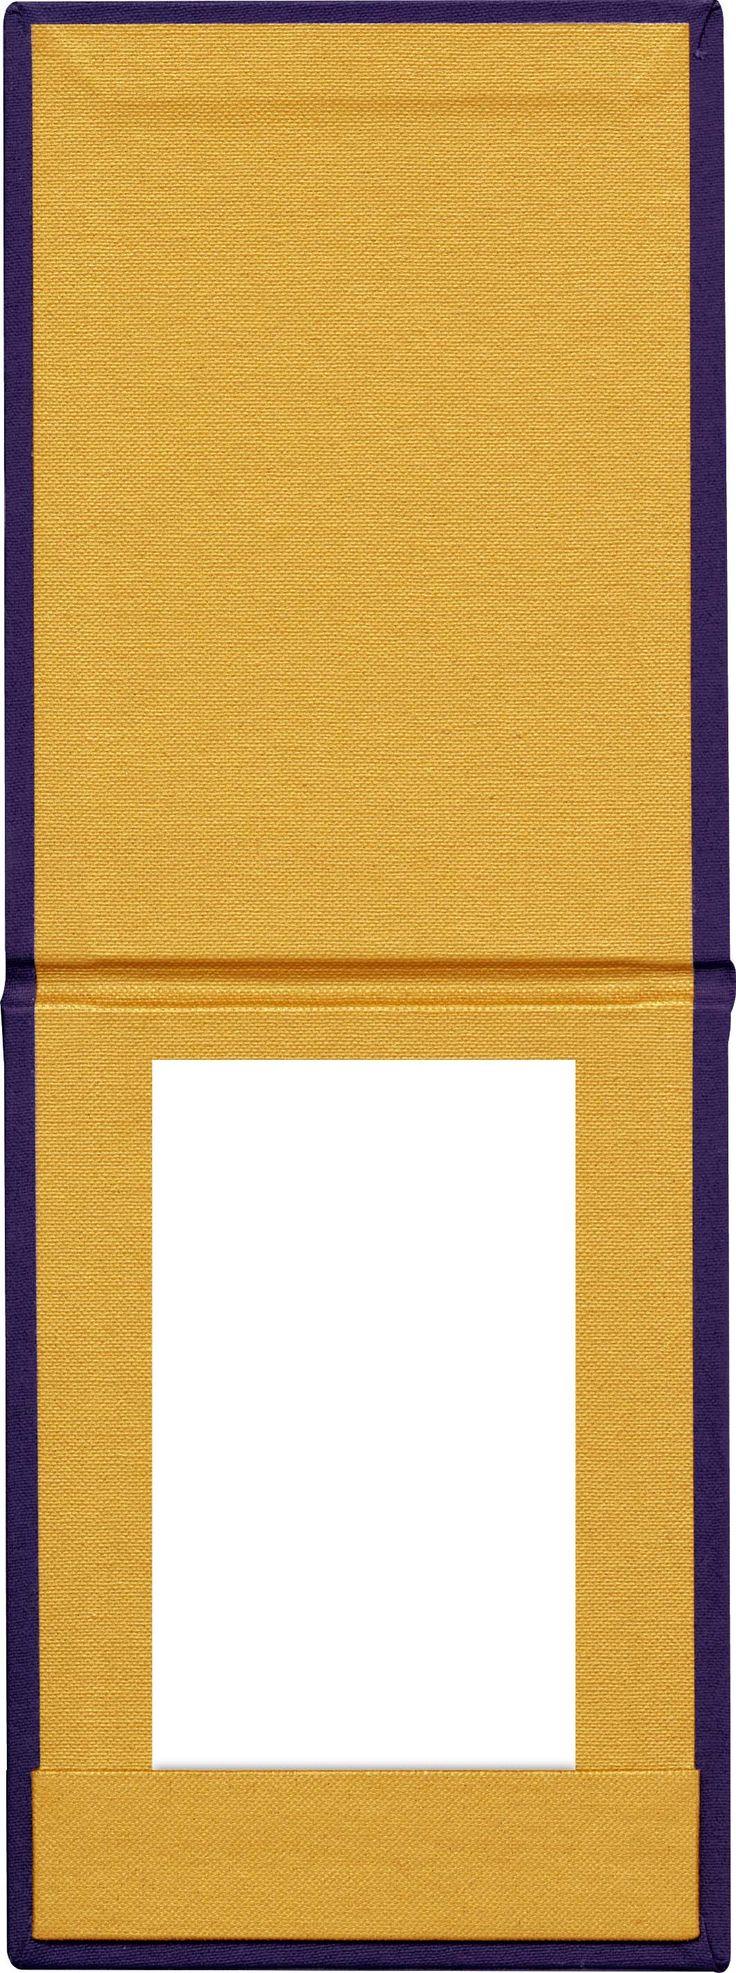 Bill Presenter   Purple Buckram - Gold Buckram - Strip Pocket - Notepad Style